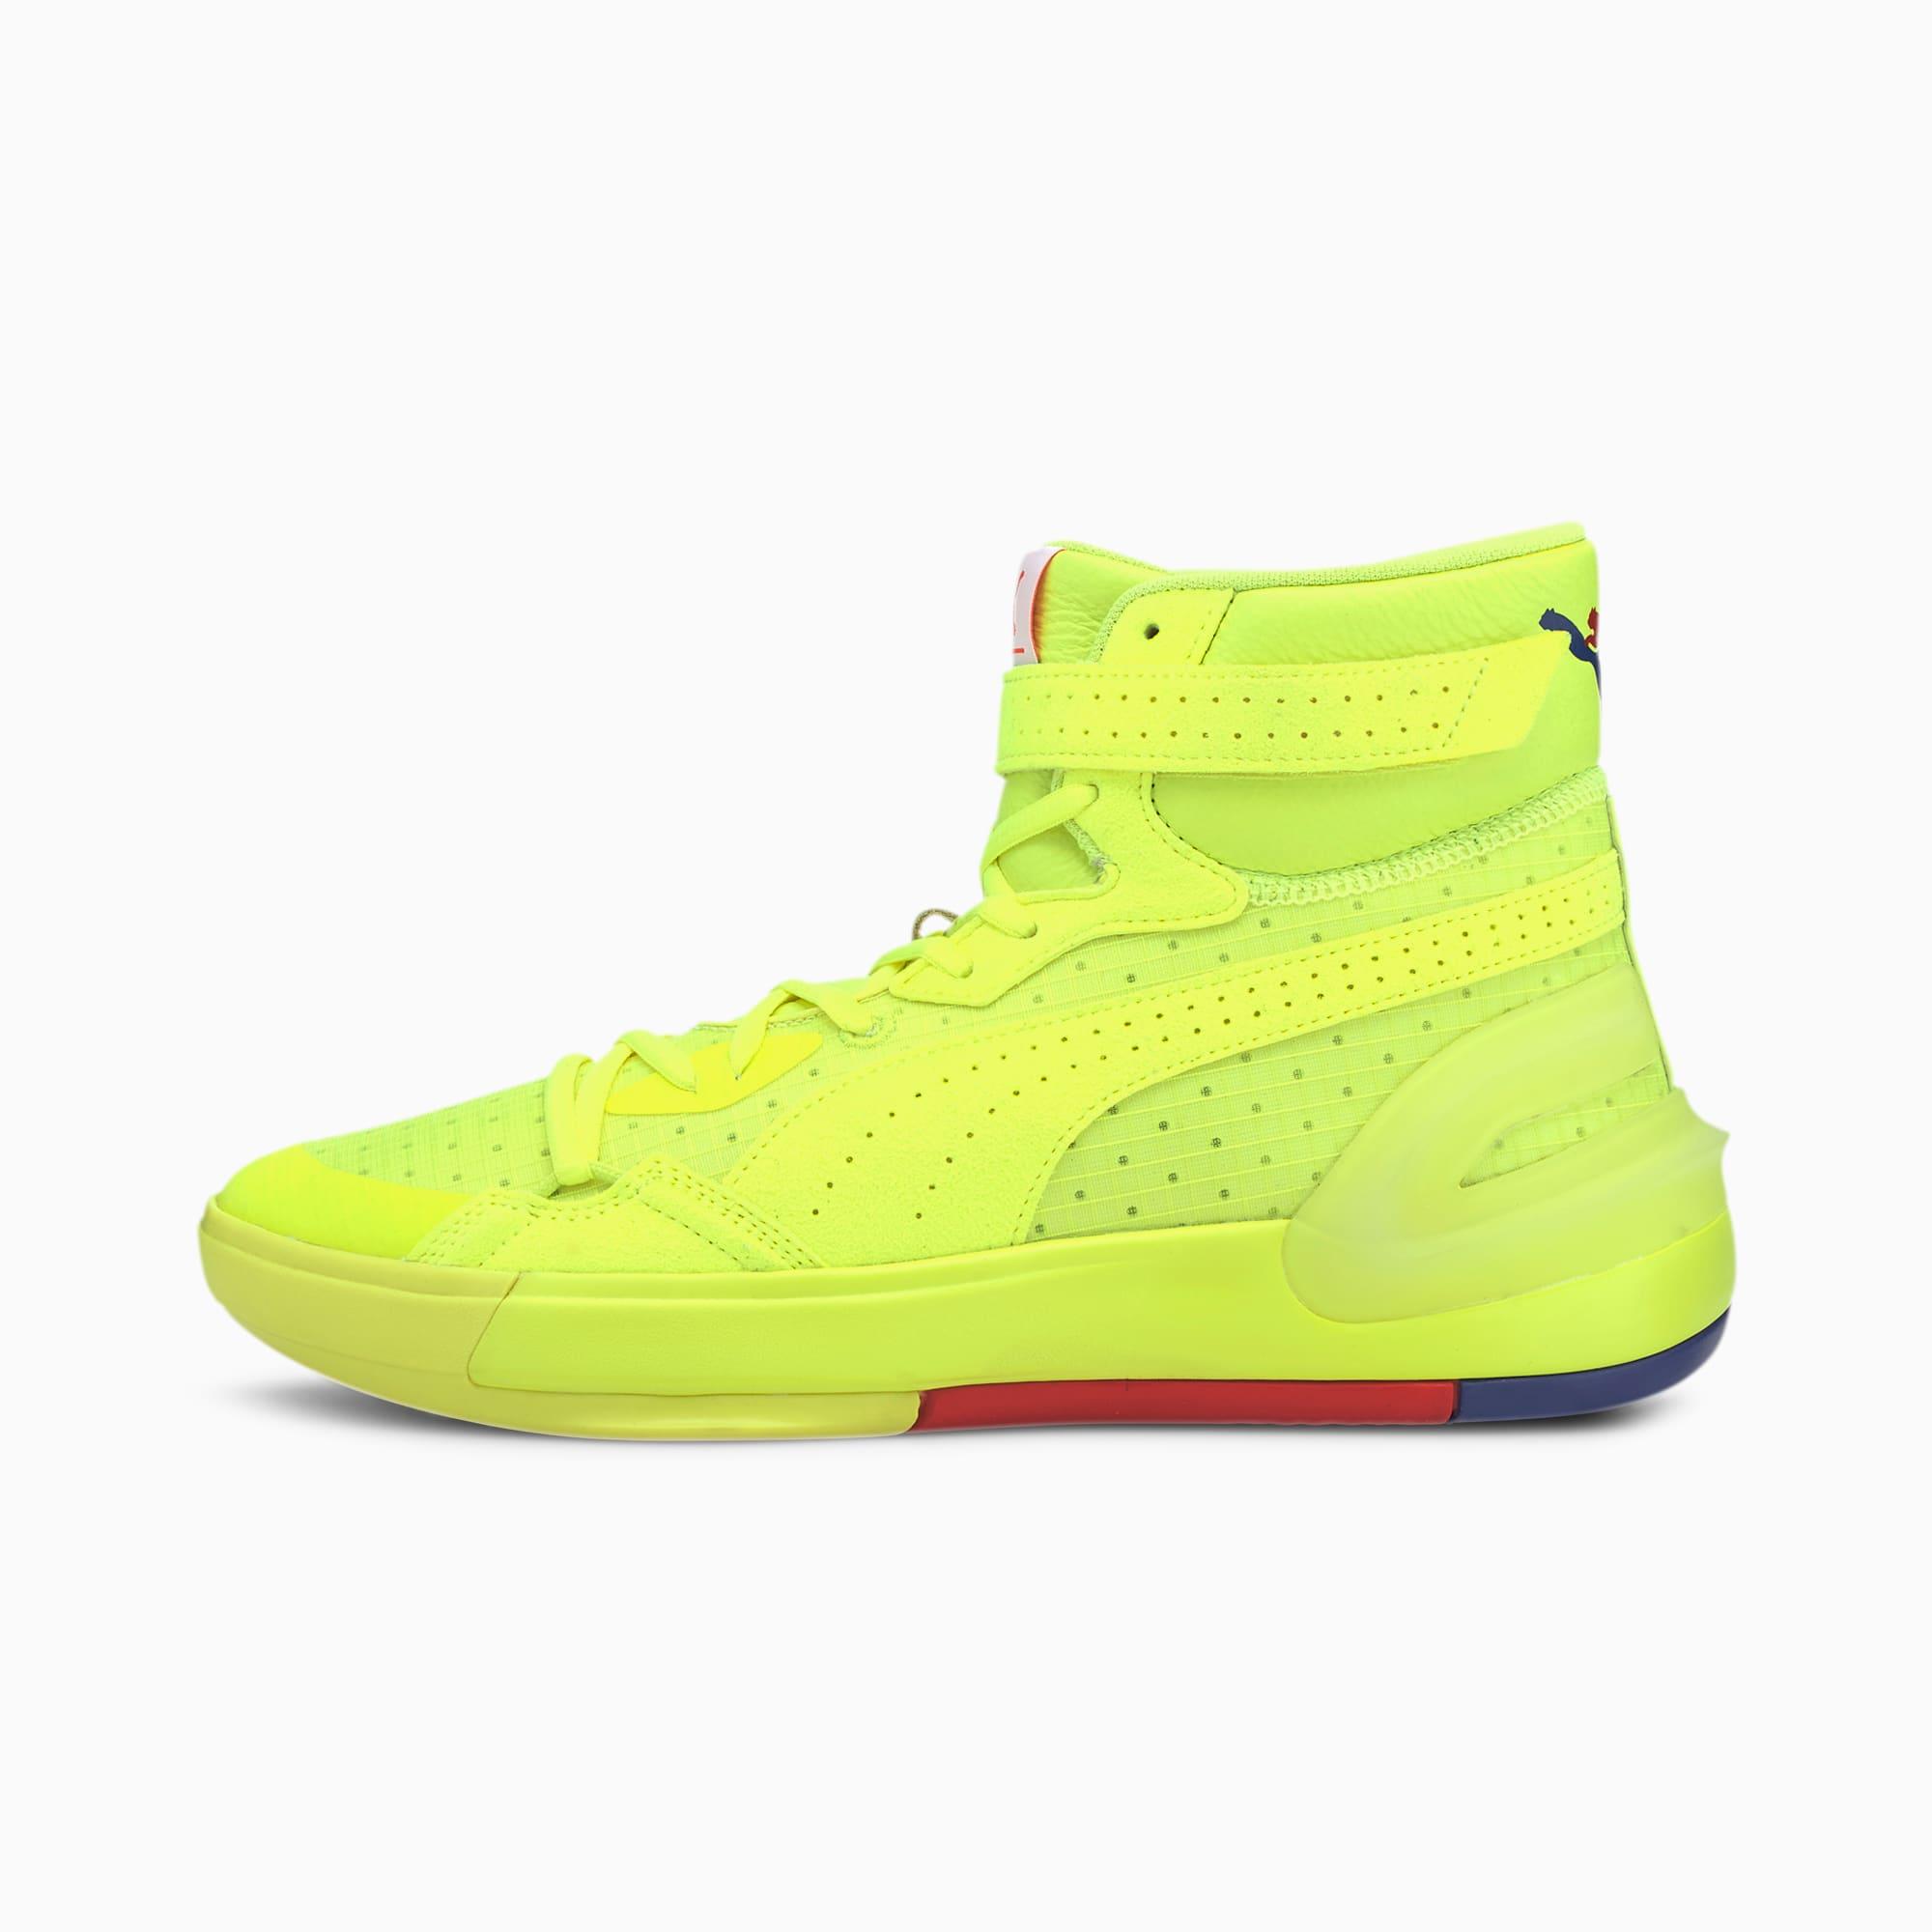 PUMA x FASHION GEEK Sky Modern Basketball Shoes